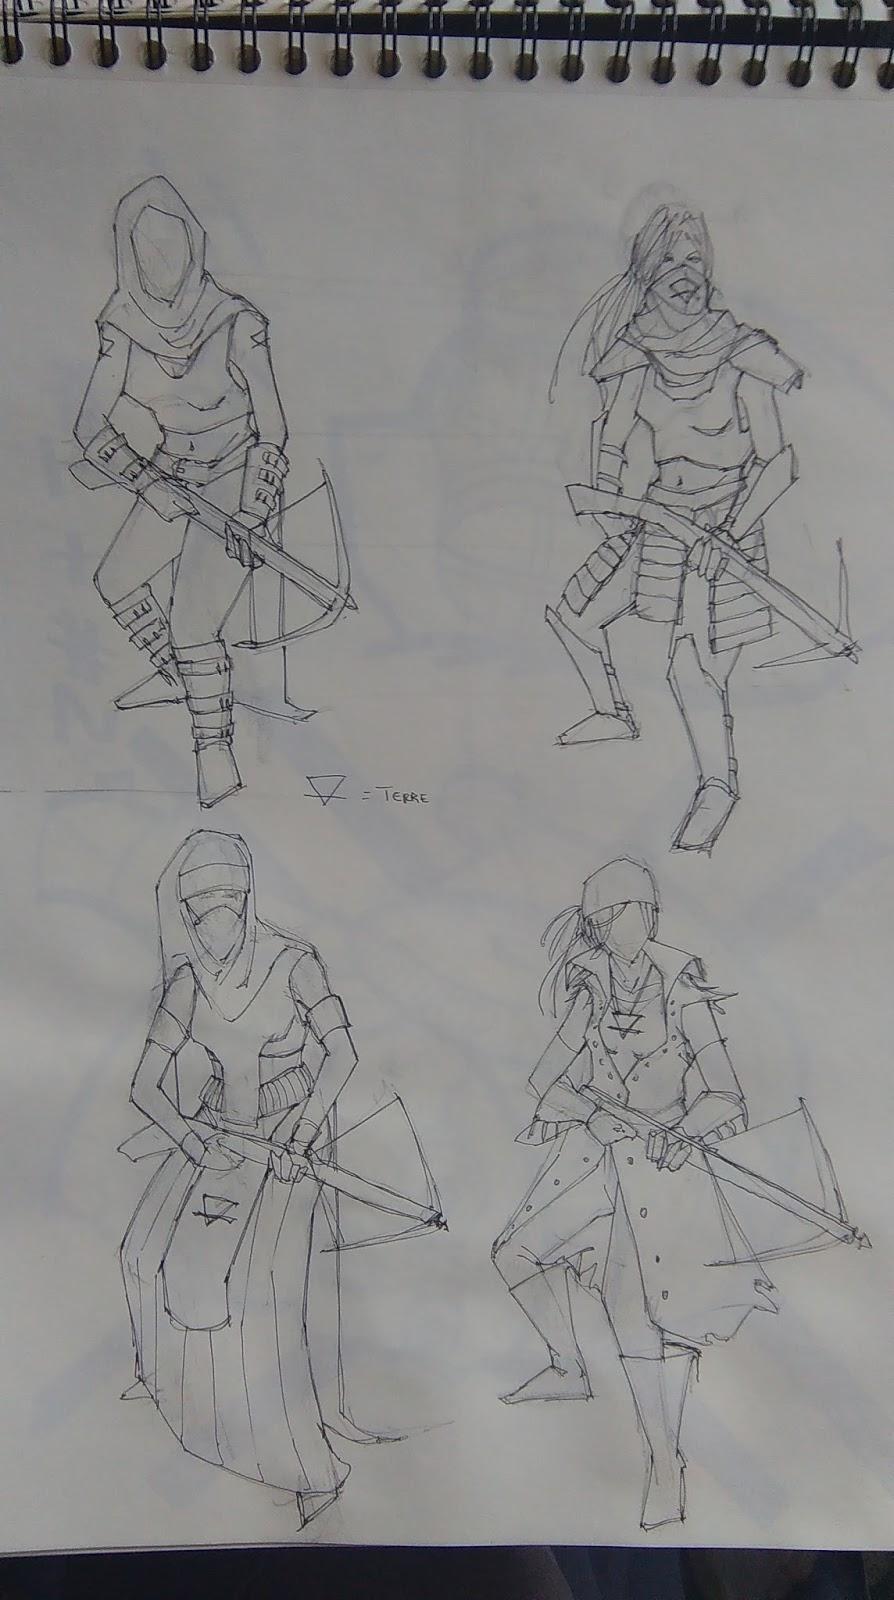 [SPOLYK] - Geometries & sketches IMAG0008